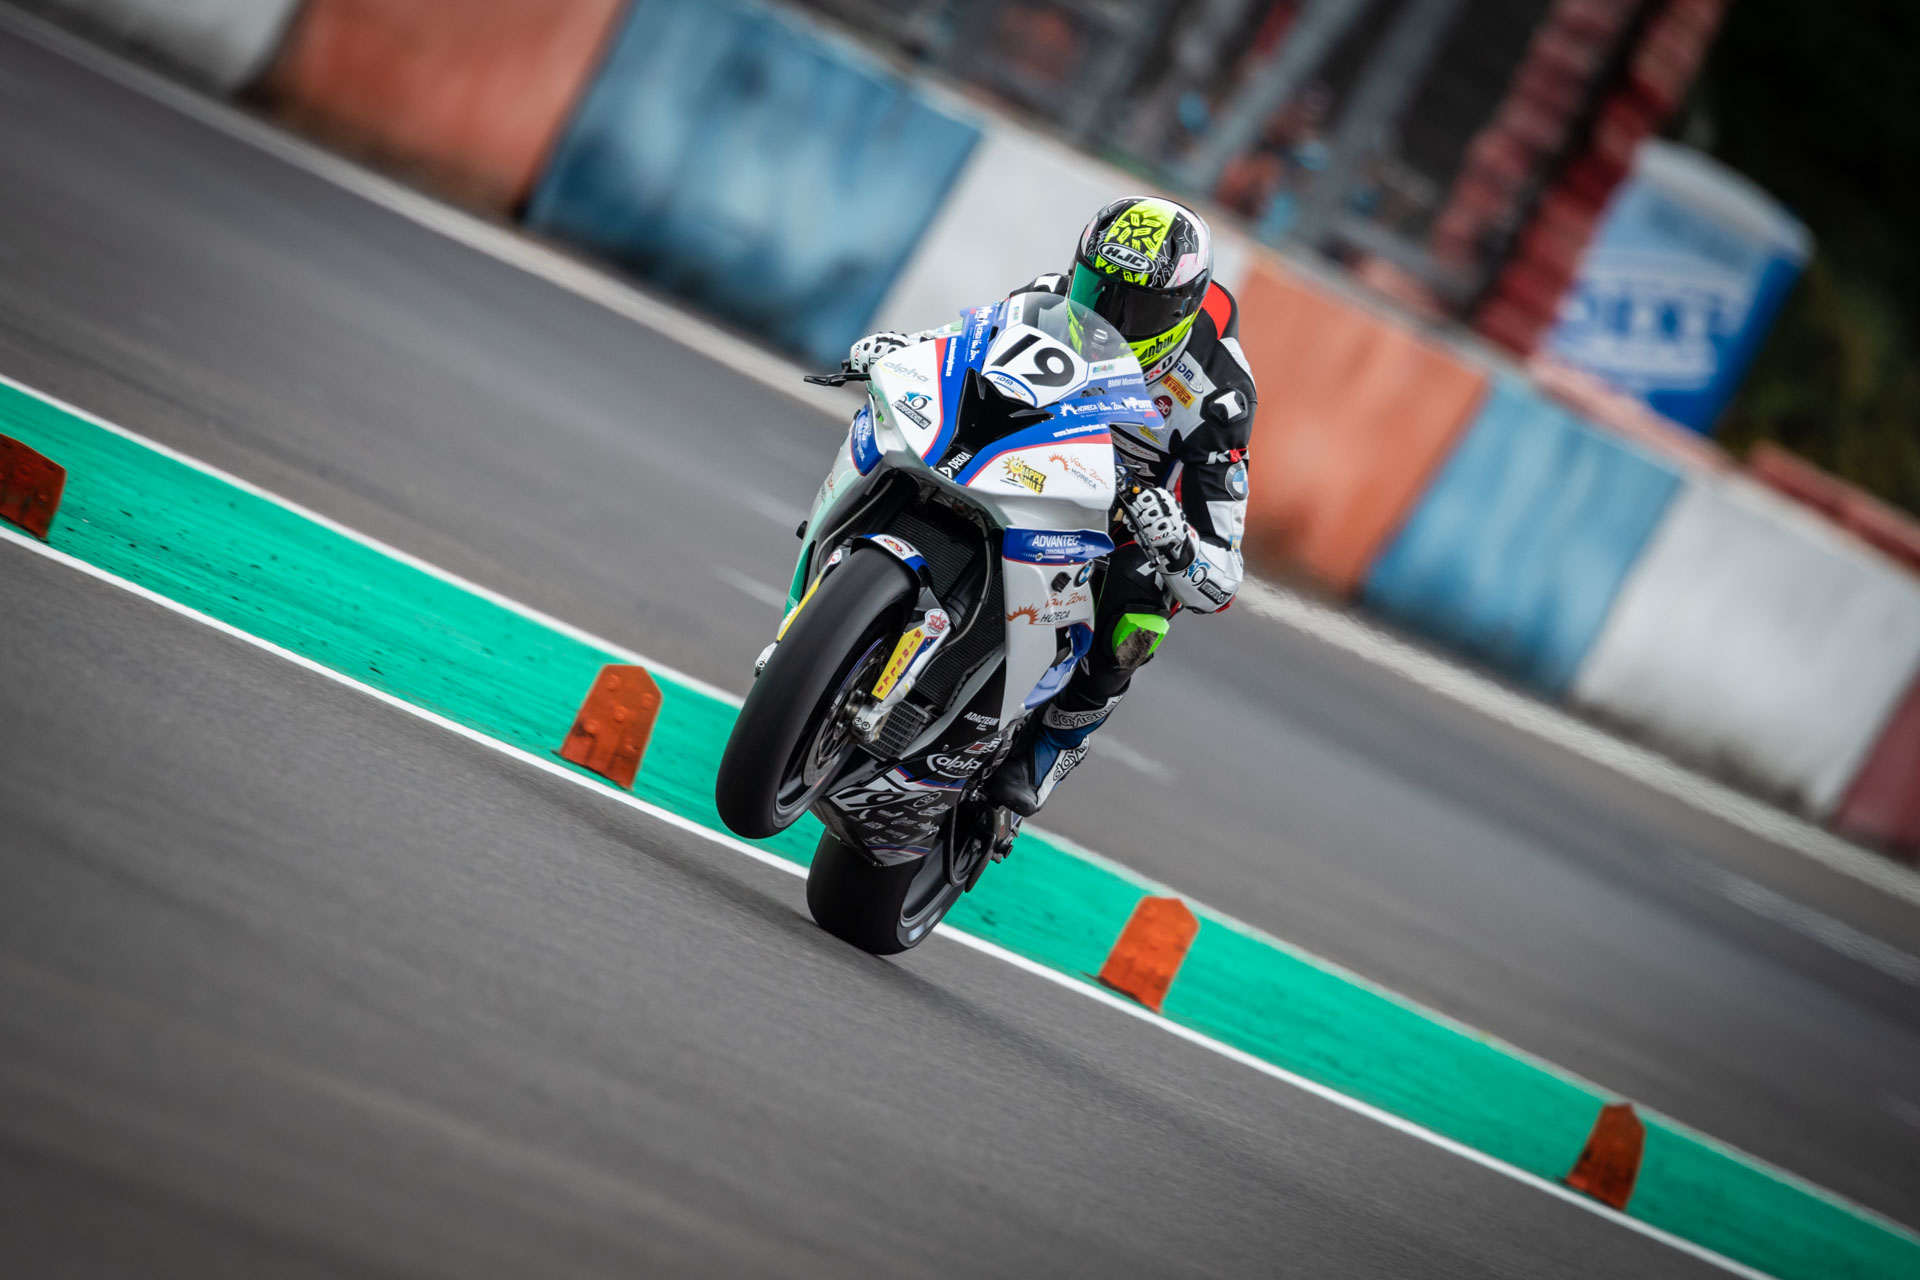 IDM_Lausitzring2018_SBK-Quali-web-15